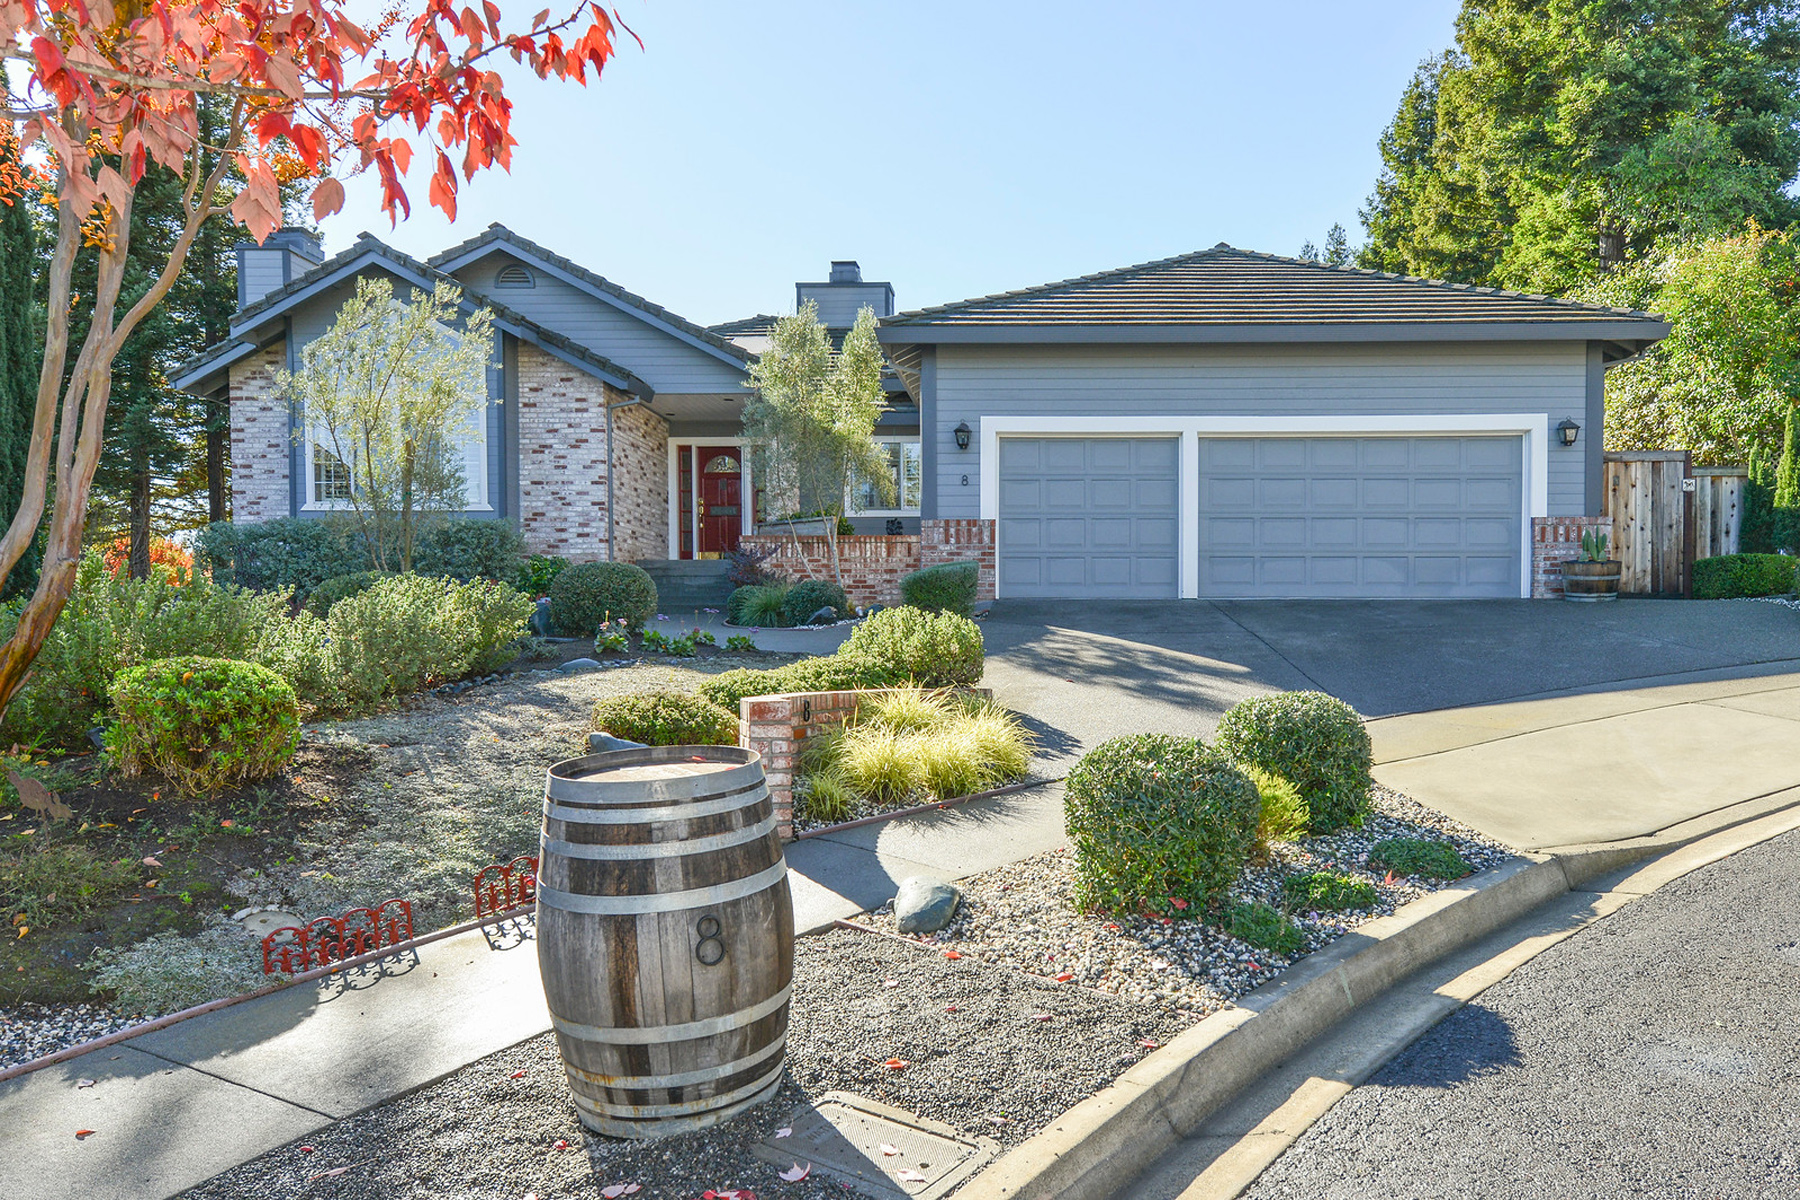 Property For Sale at 8 Saint Francis Ct, Napa, CA 94558